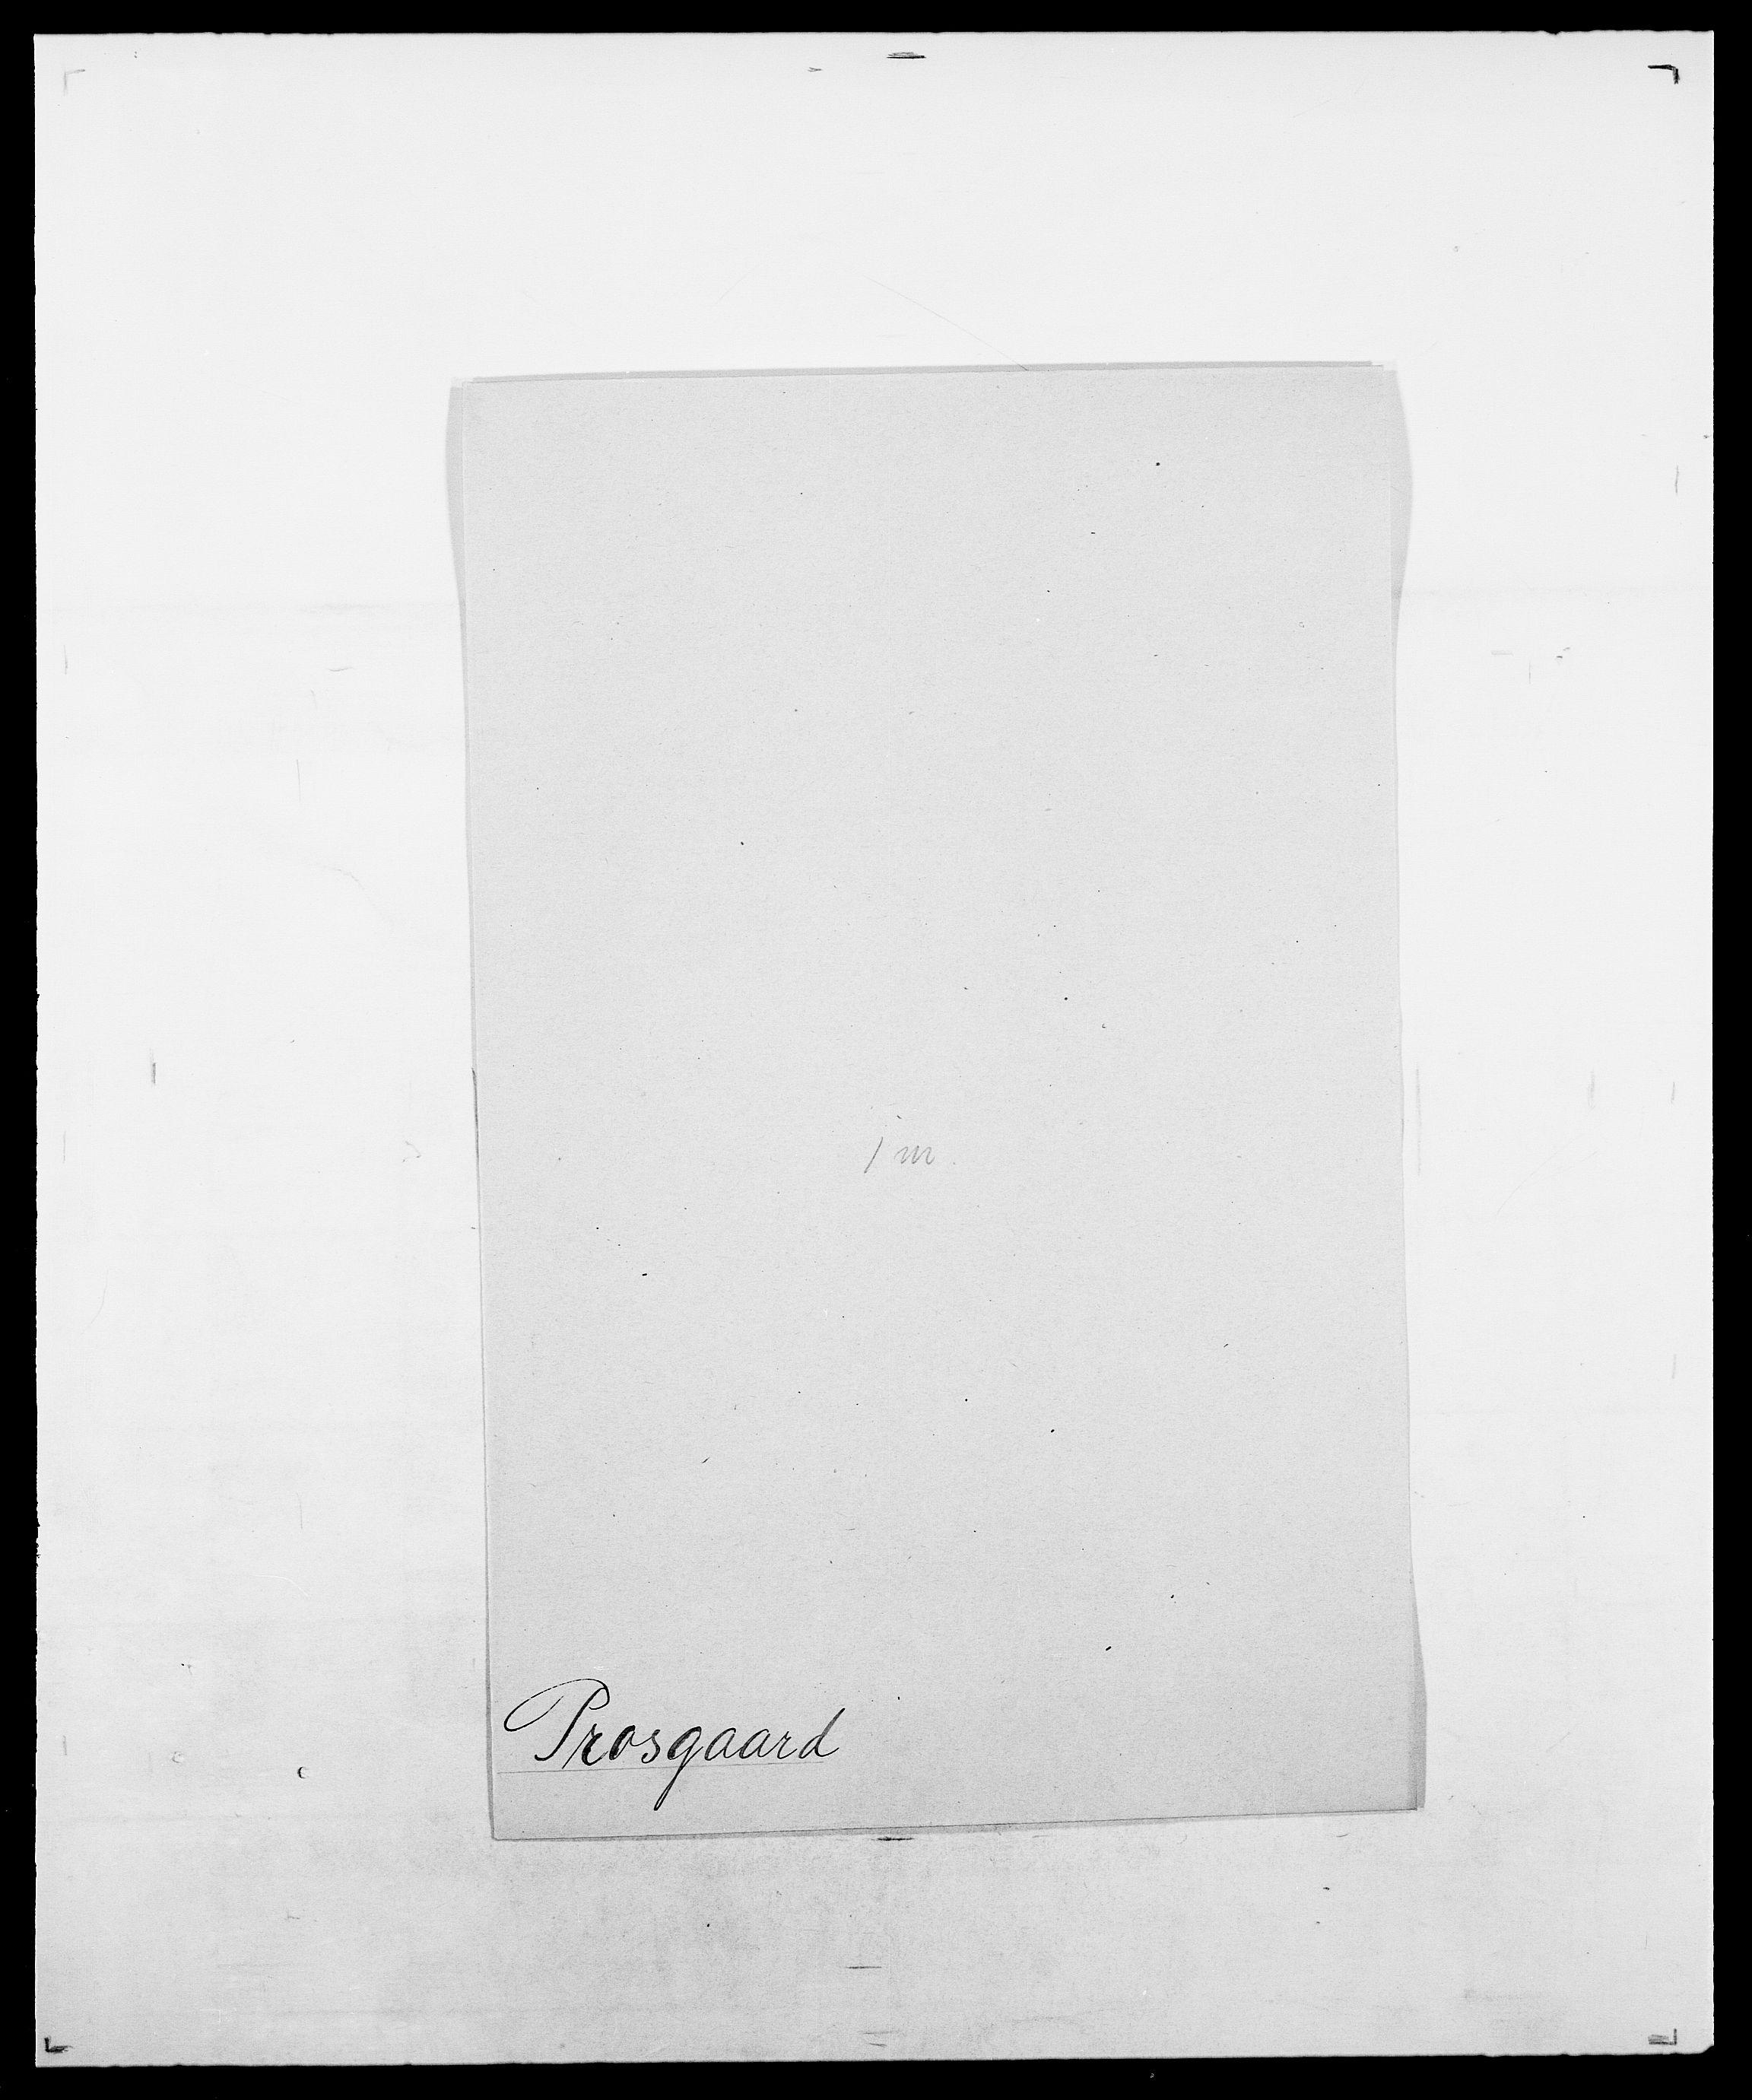 SAO, Delgobe, Charles Antoine - samling, D/Da/L0031: de Place - Raaum, s. 373